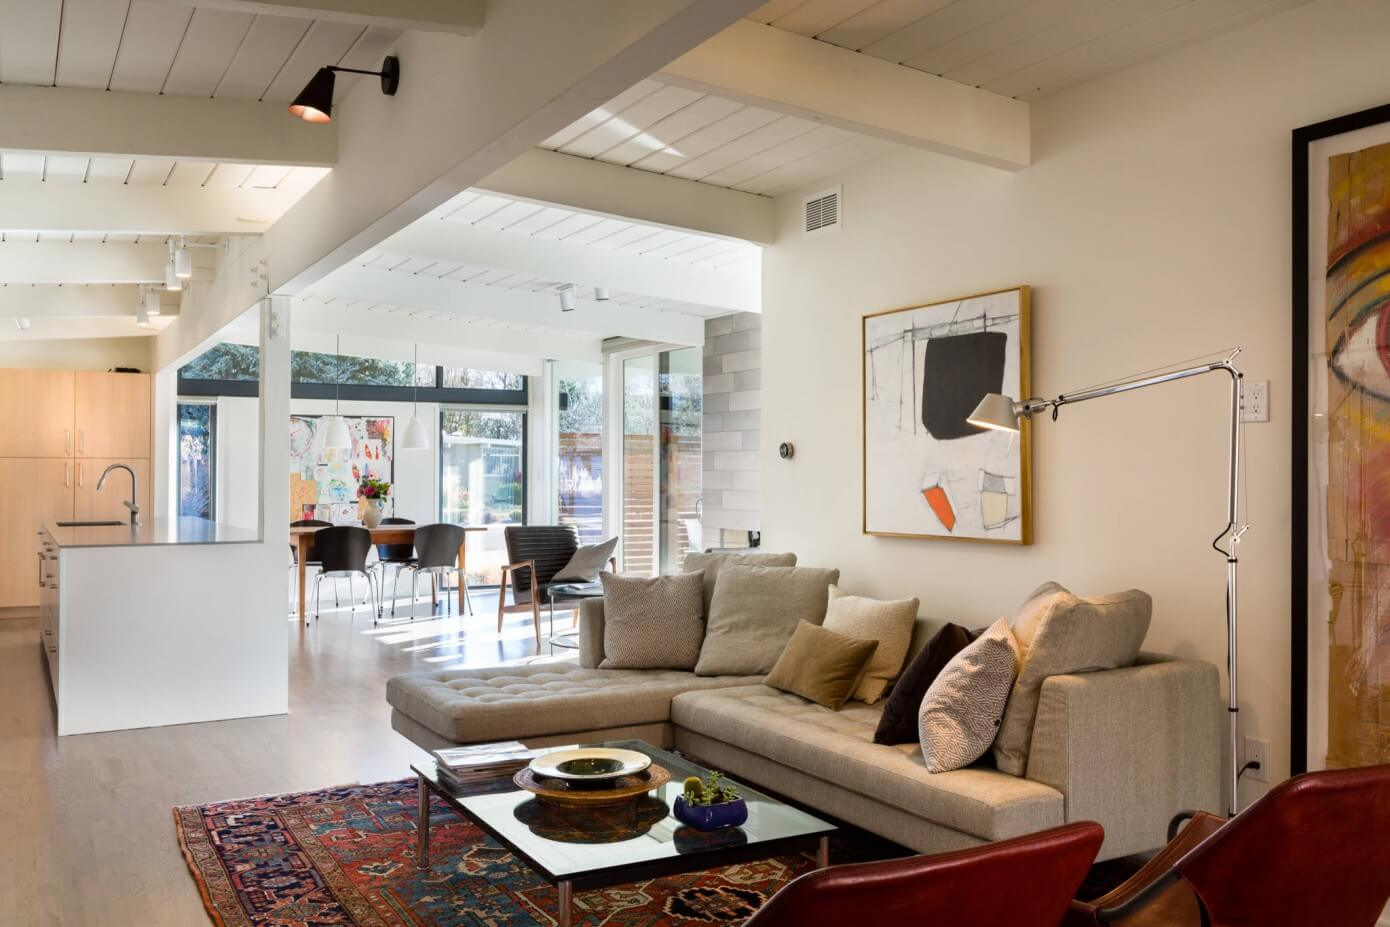 mid-century moderncadence design studio | homeadore